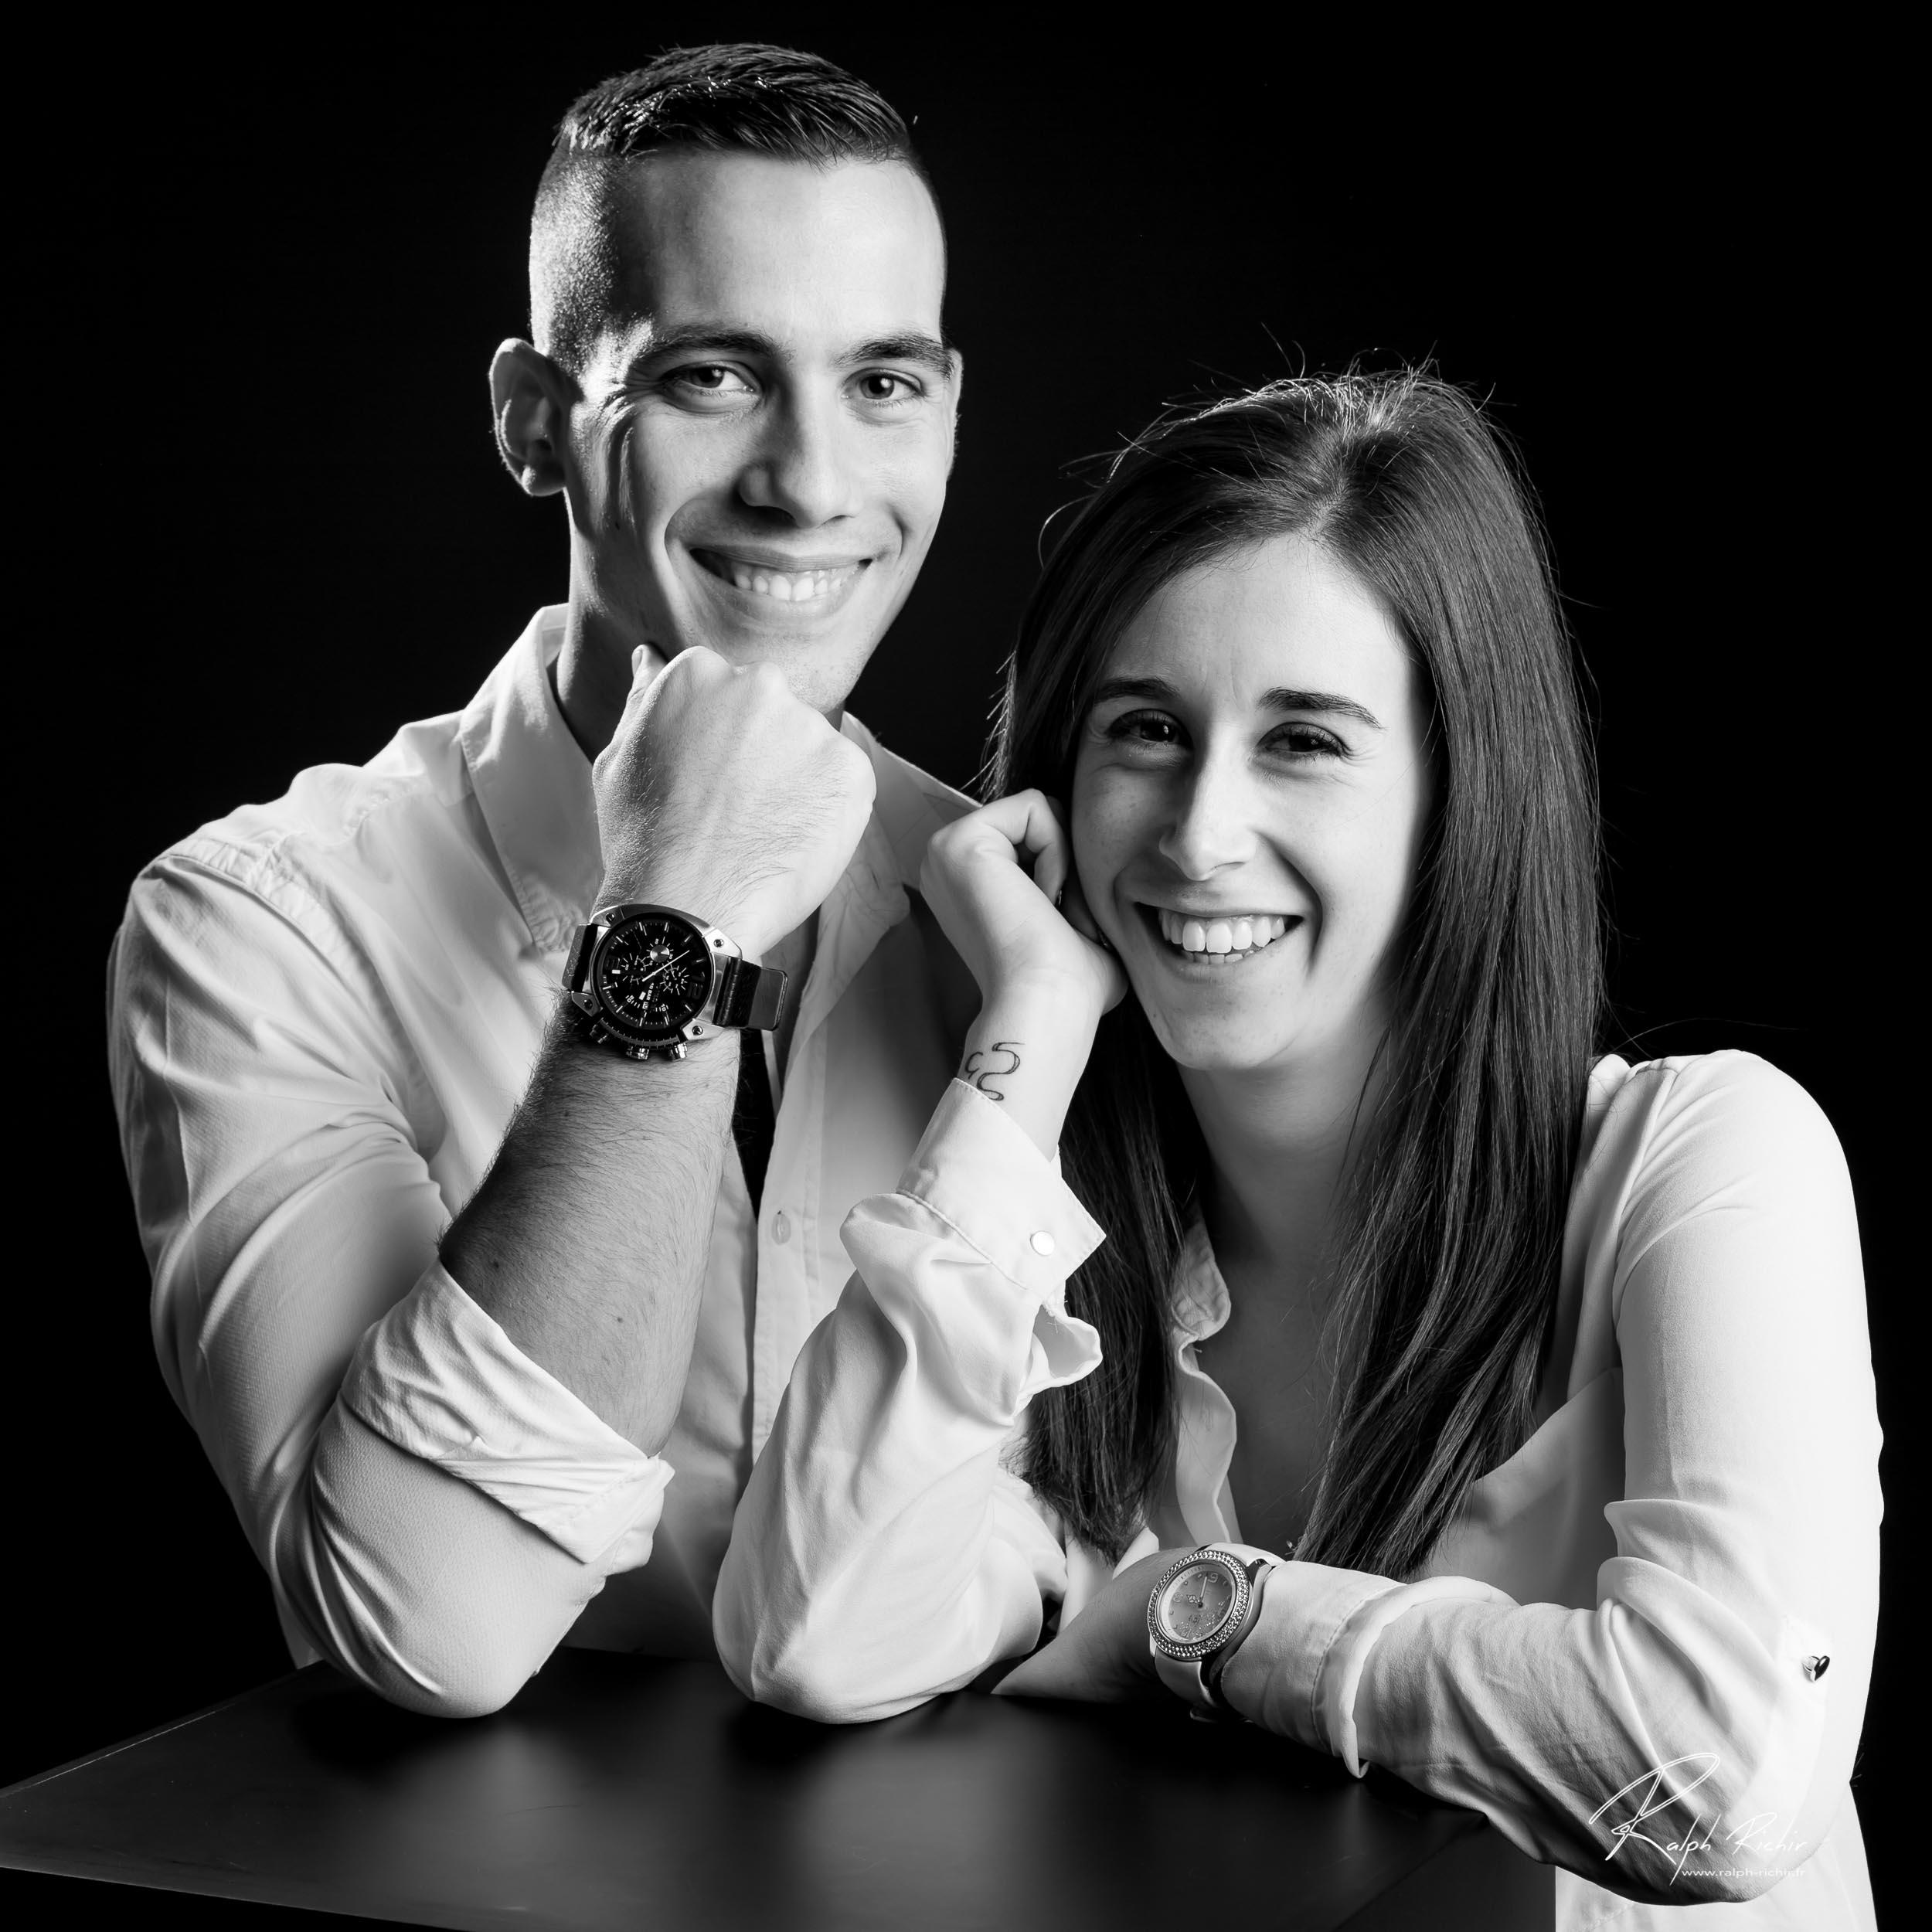 potrtait, photo de couple, studio photo, toulon, galerie ralph richir, www.ralph-richir.fr-2